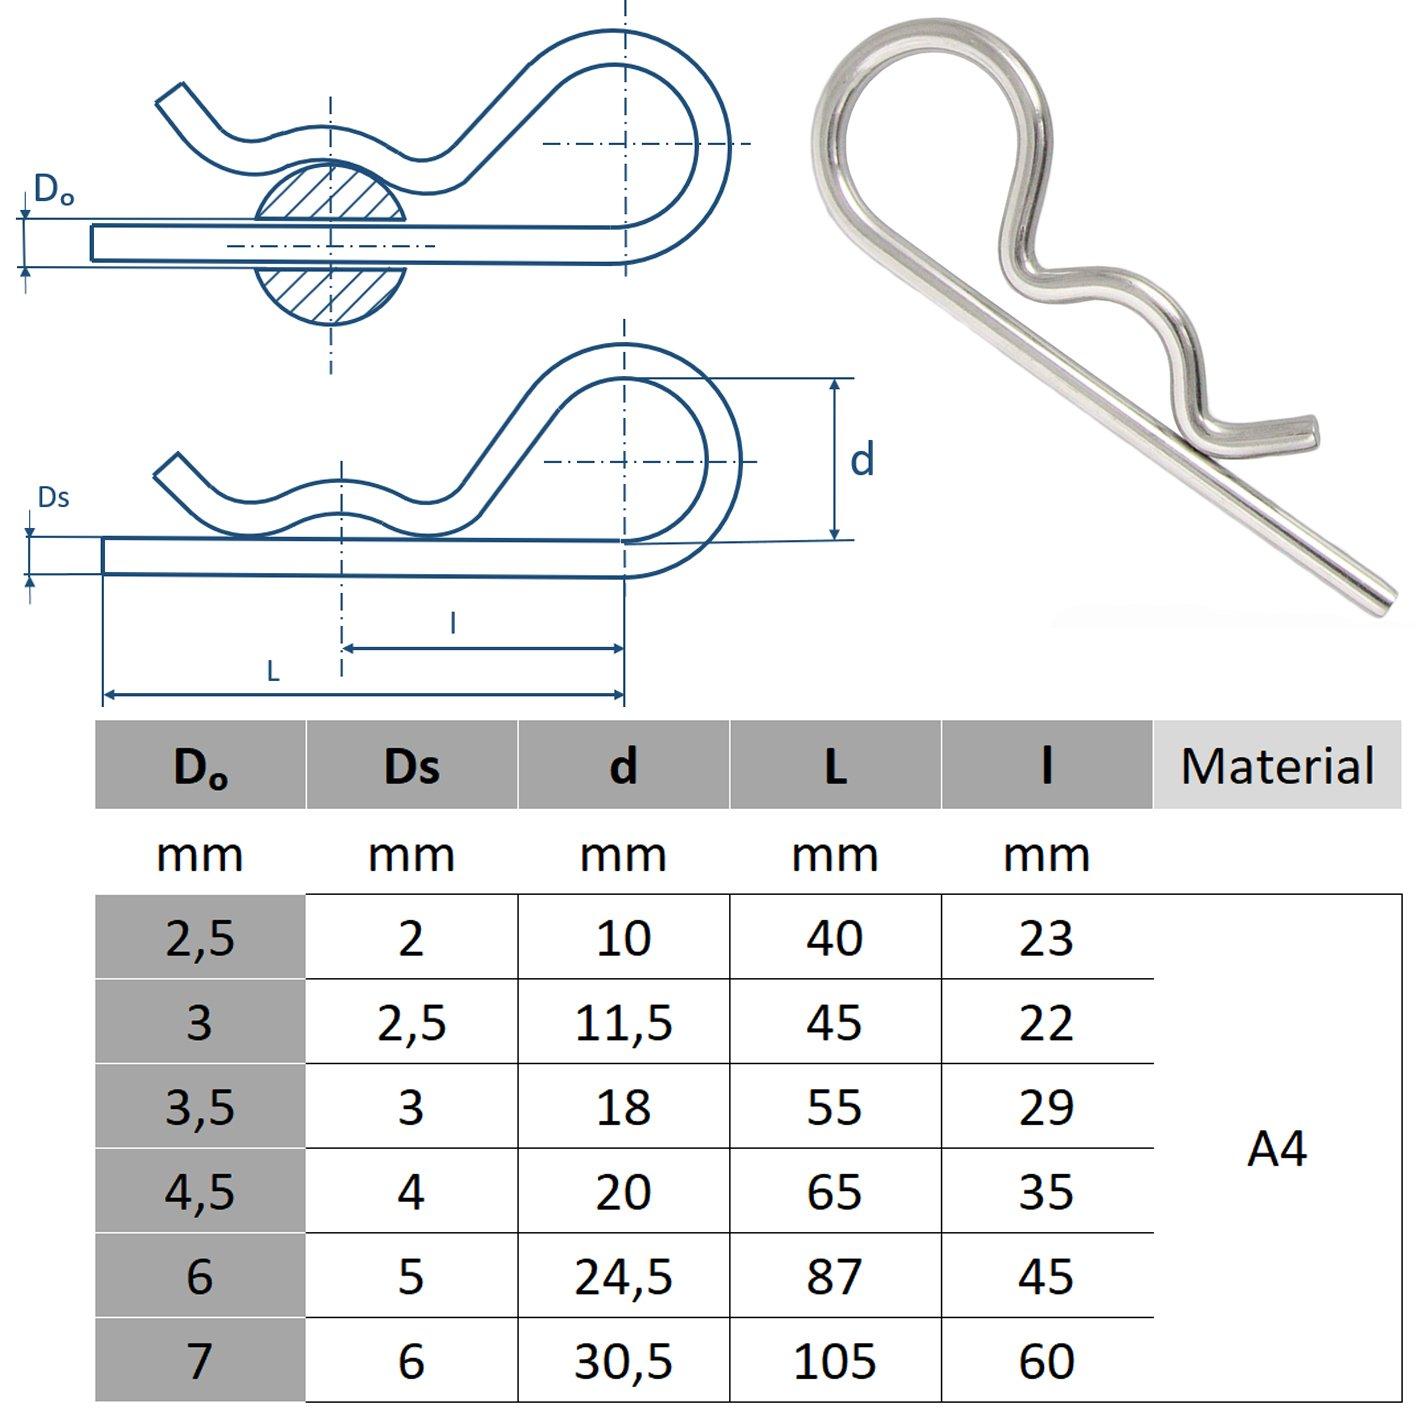 1 St/ück BOOTSTEILE BRAUER/® Federstecker Einfach D= 2,5 x 55 mm - - Stecker//Splint aus Edelstahl A4